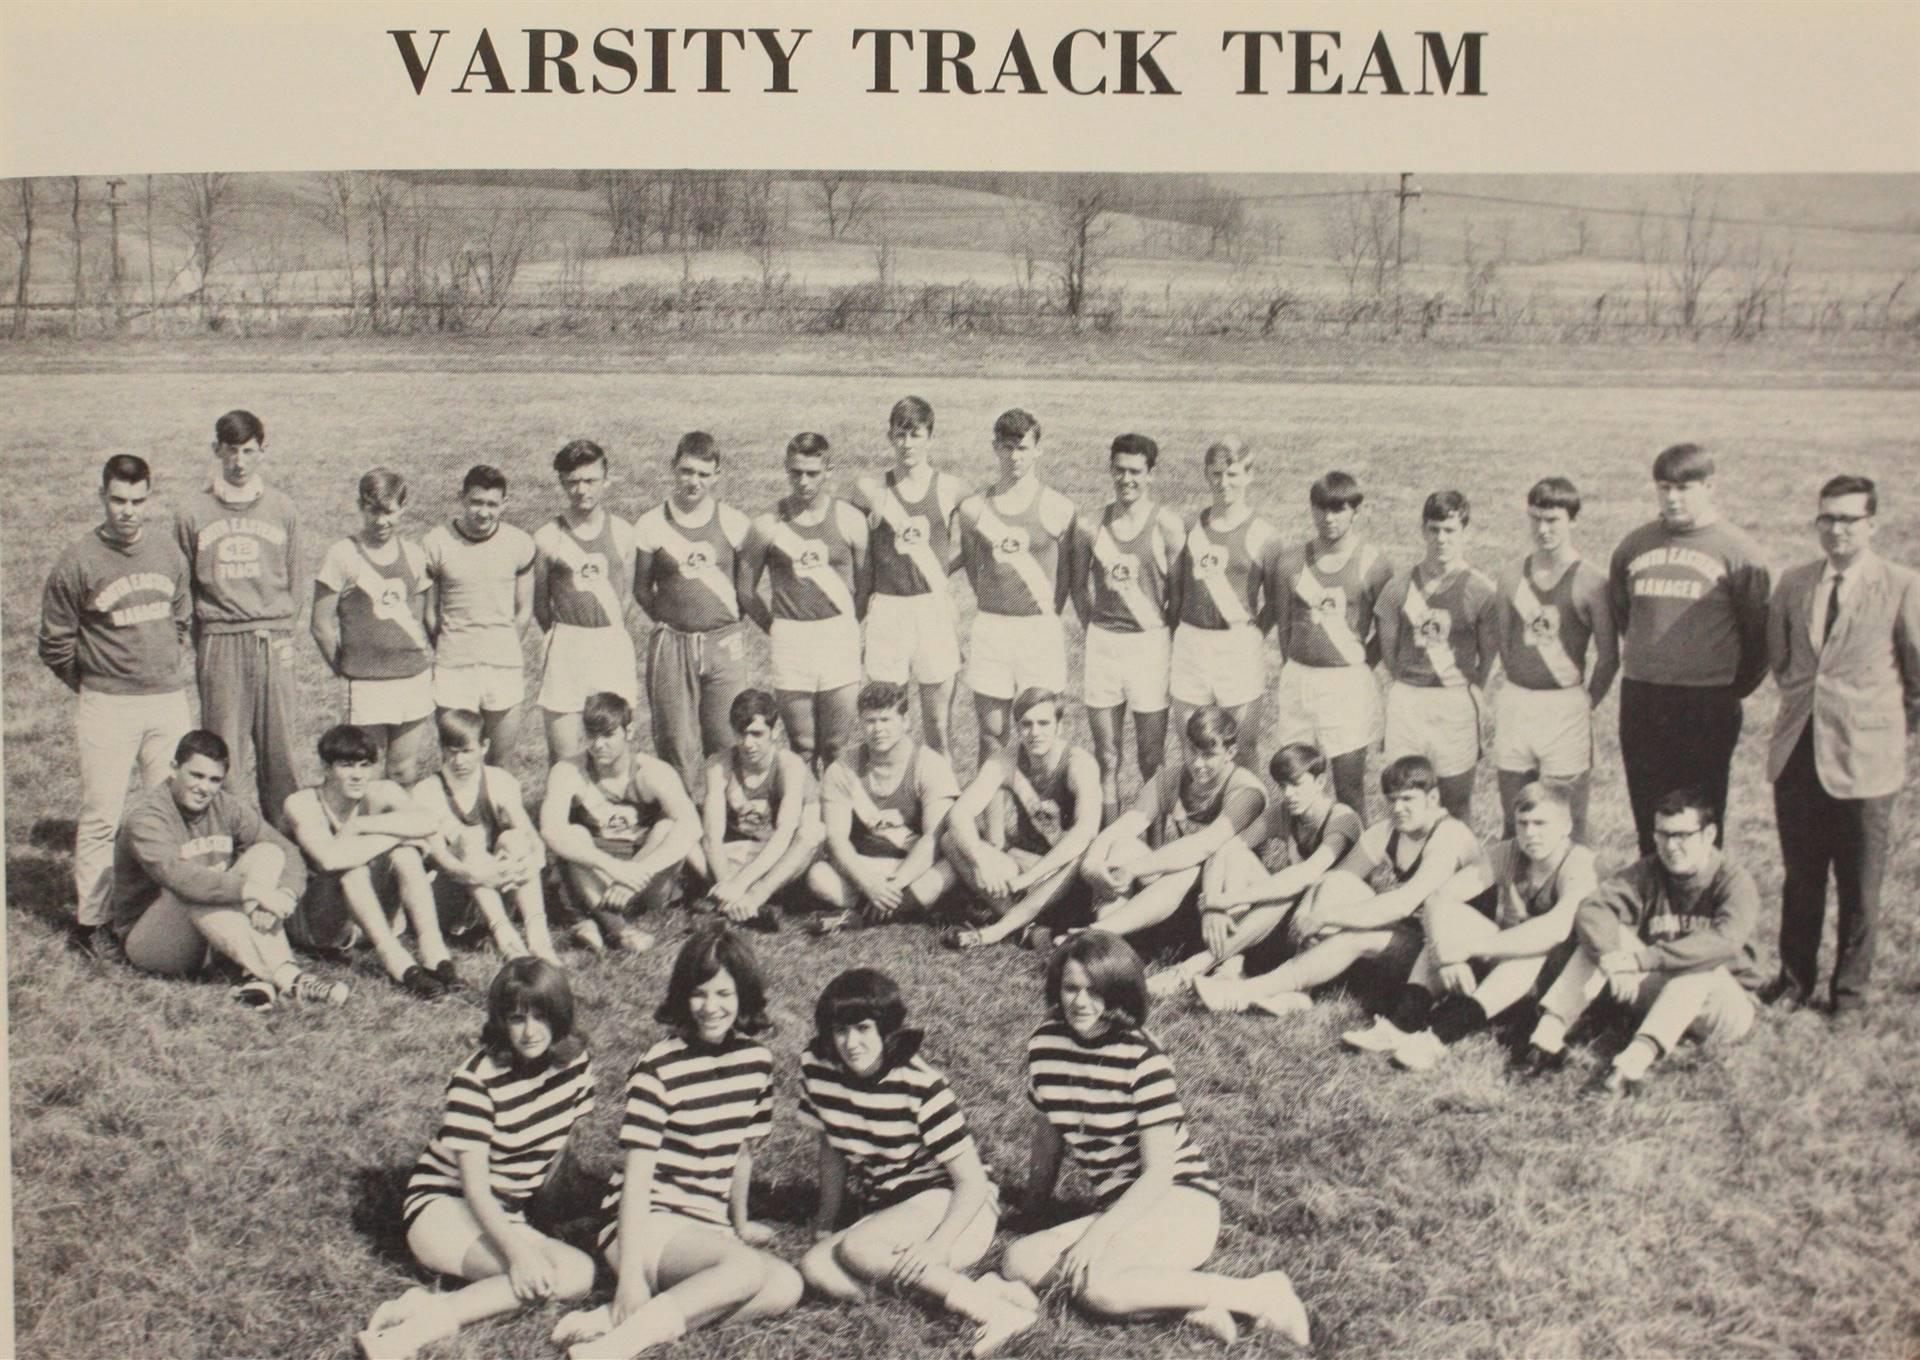 1969 Varsity Track Team